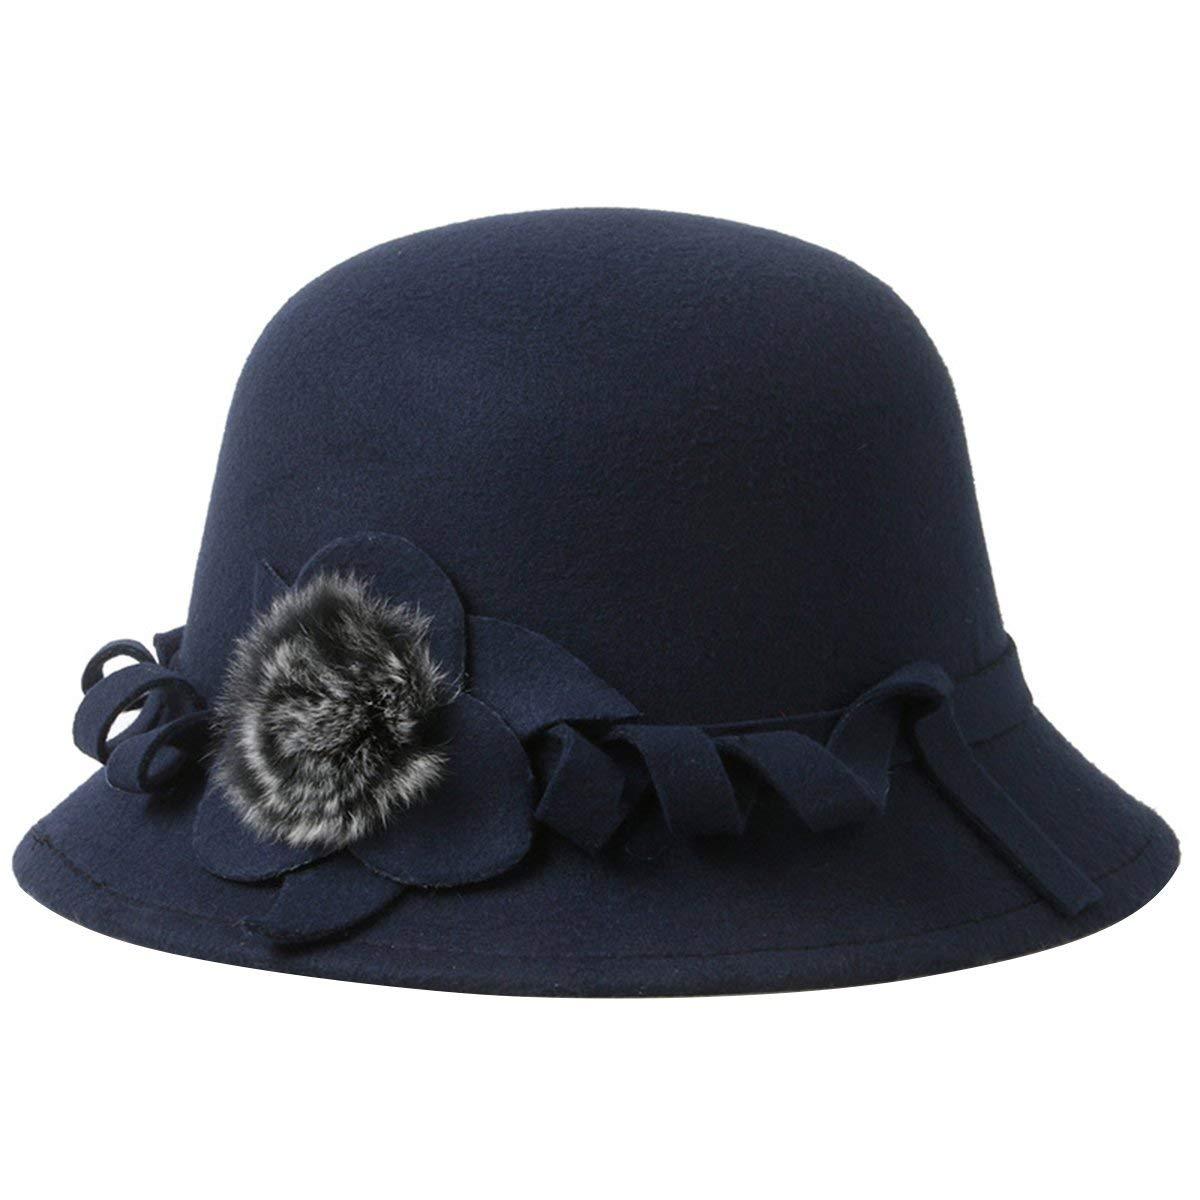 80261ba09e17b4 Get Quotations · EUBUY Women Vintage Wool Felt Bowler Hat Winter Fedora Hat  Floppy Hat Wide Brim Cloche Hat